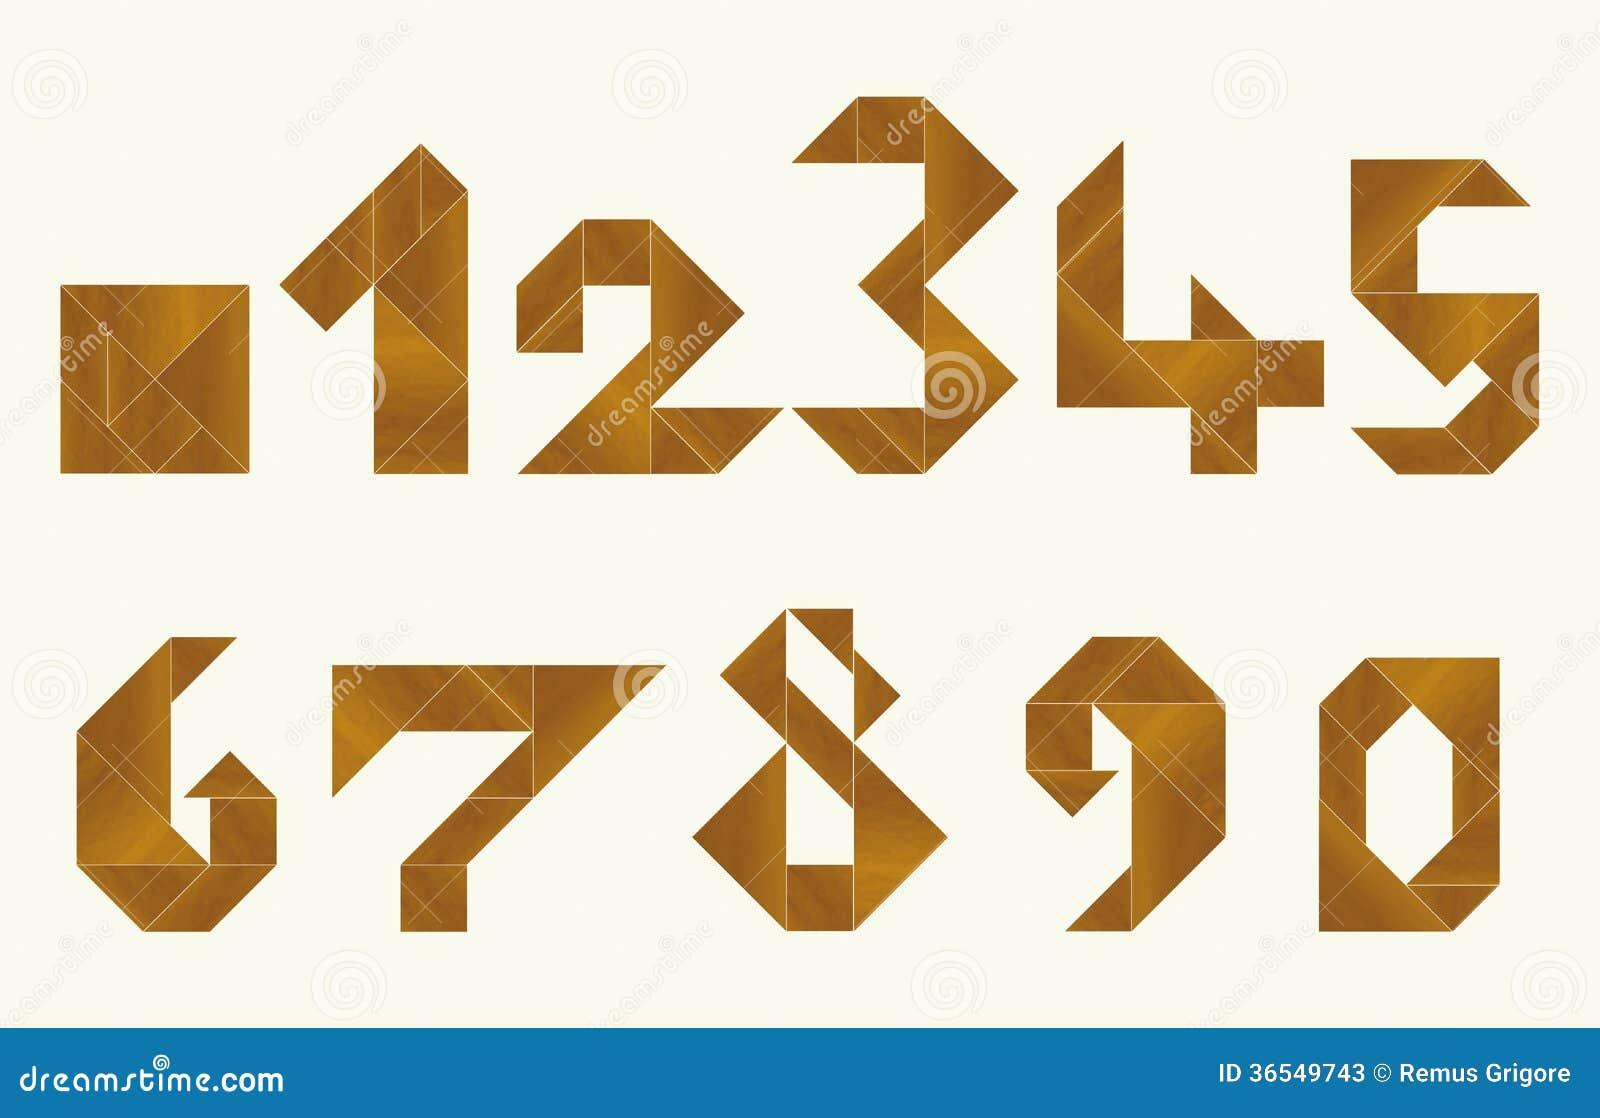 Tangram, Numbers - Cdr Format Stock Photos - Image: 36549743